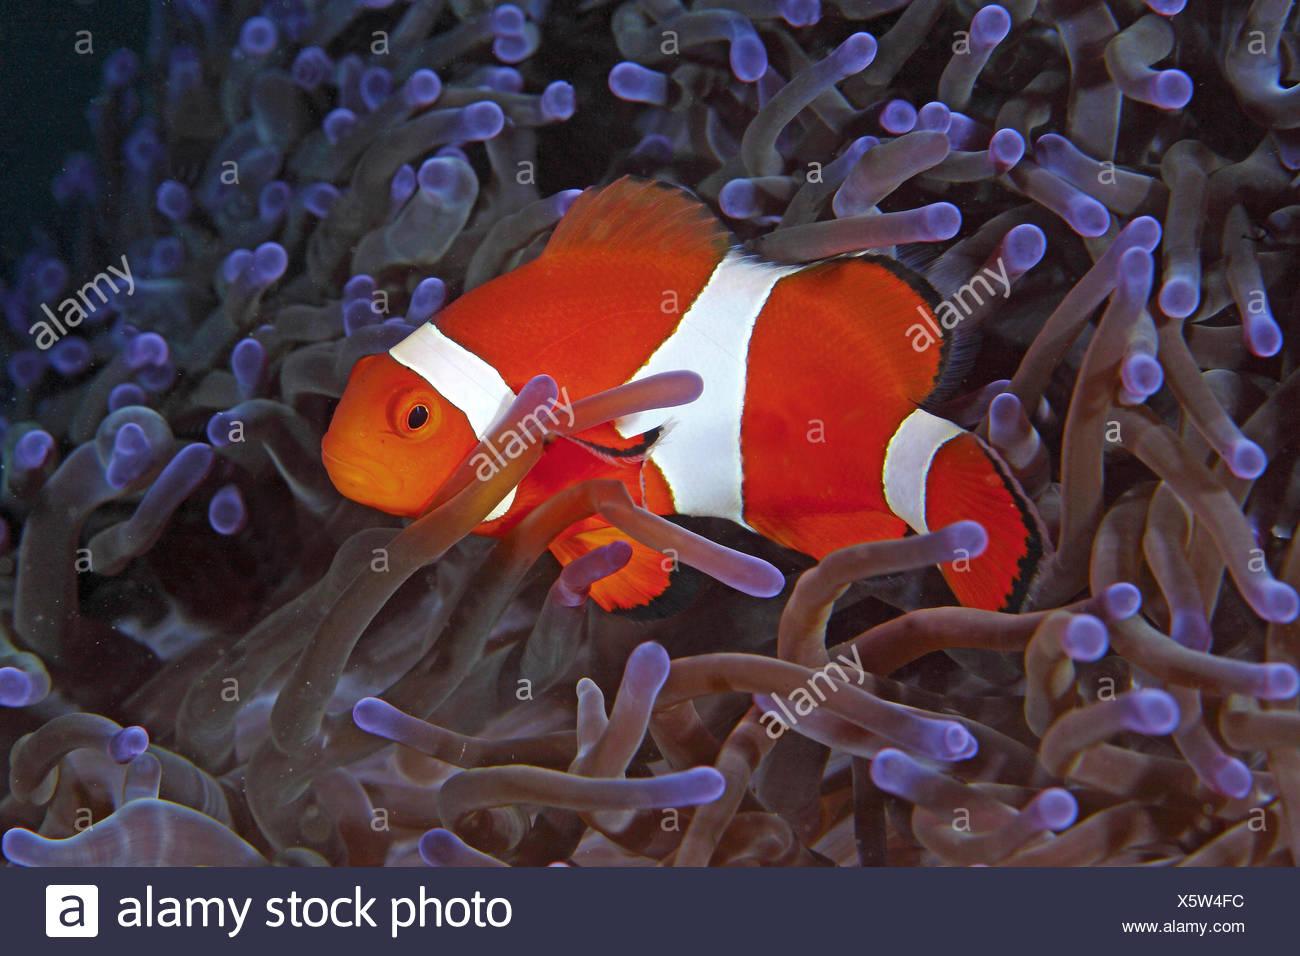 Ocellaris clownfish (Latino), en anémone de mer (actiniaria), indo-pacifique, philippines Banque D'Images